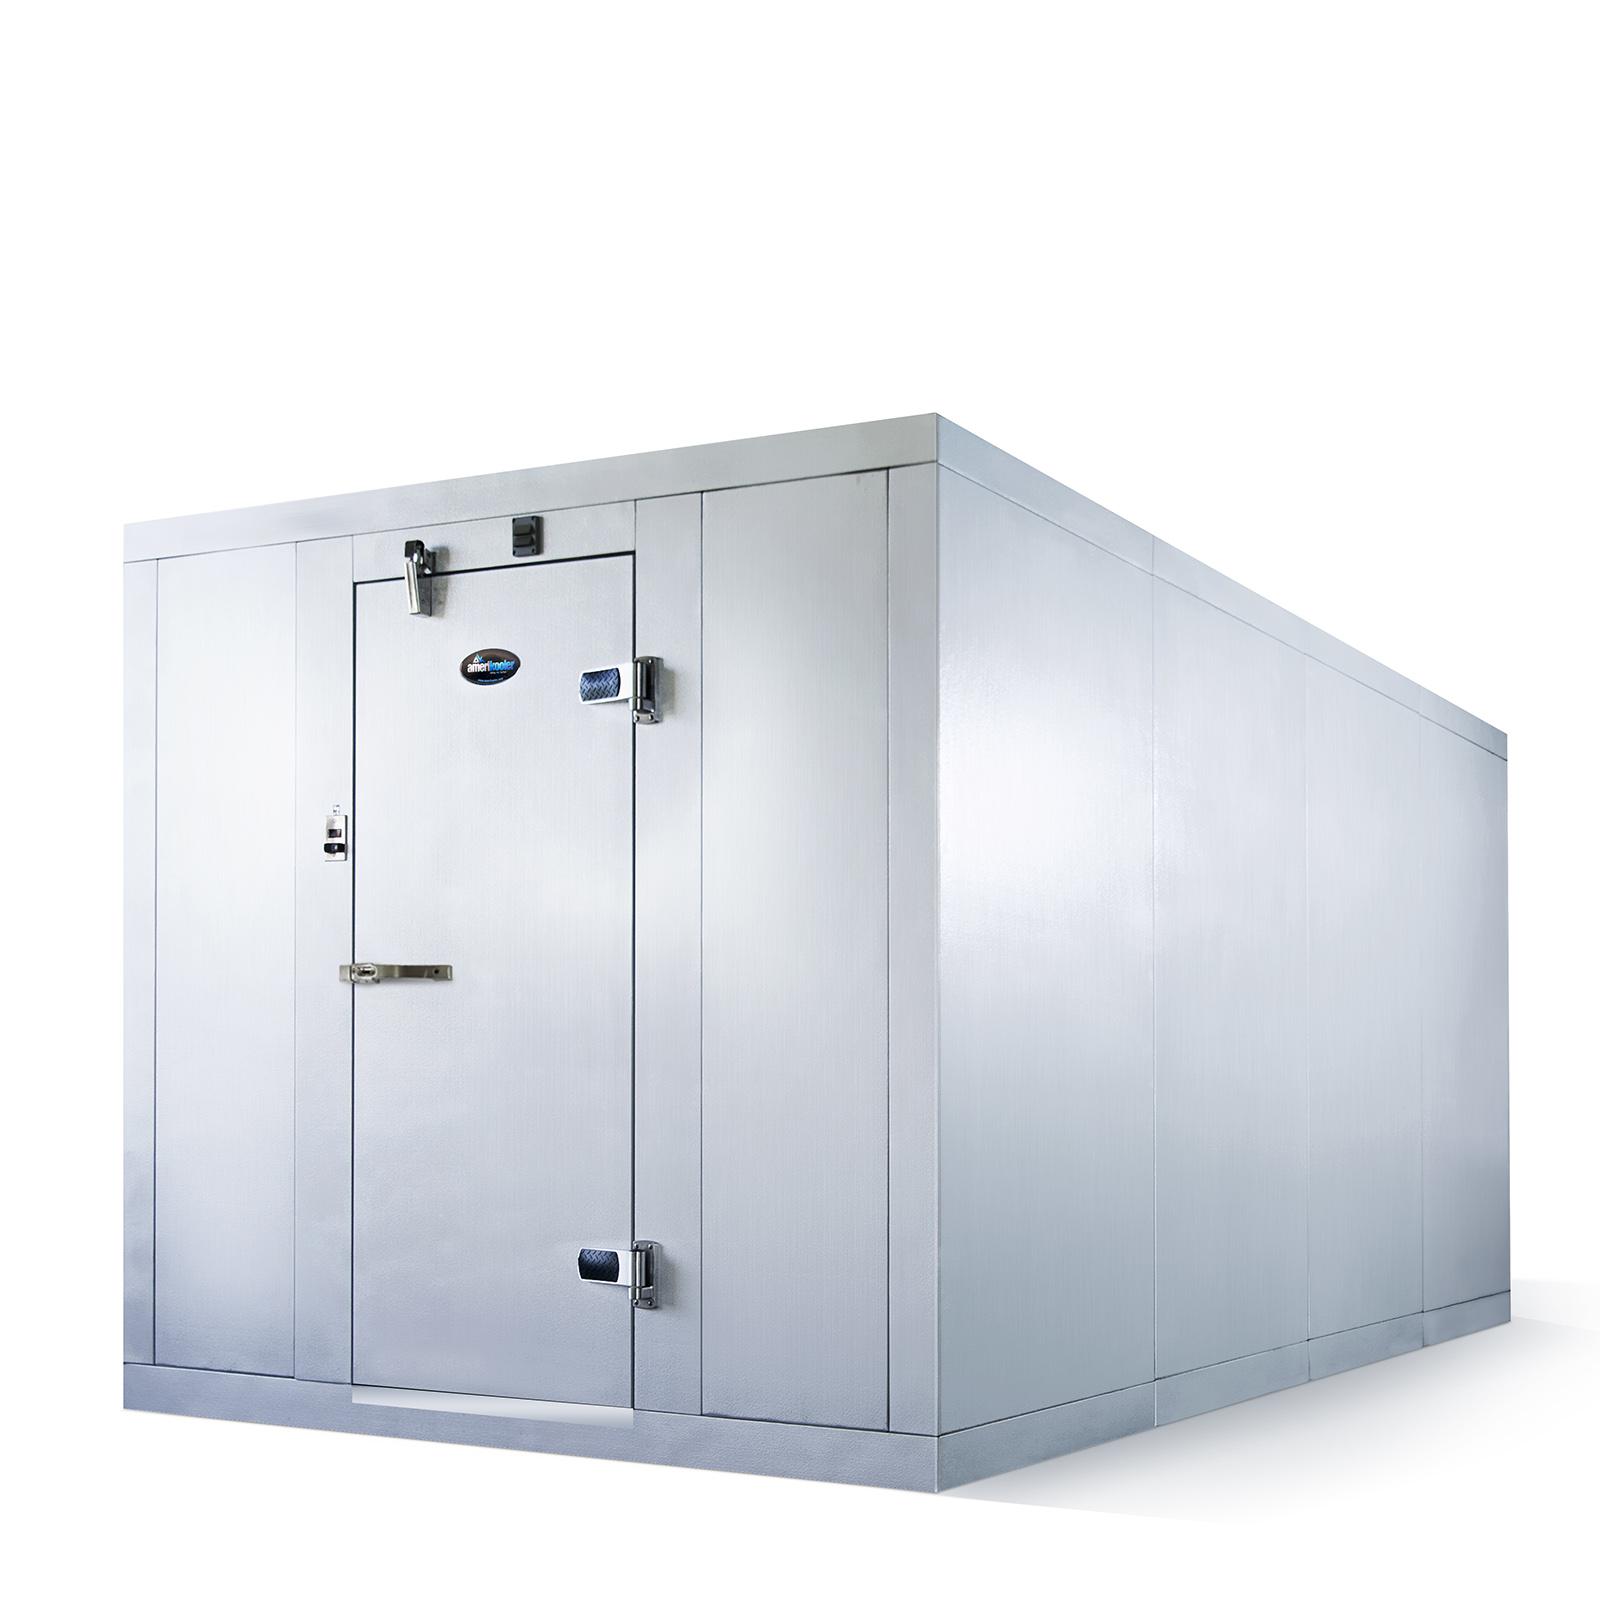 AmeriKooler DC081877**FBRC walk in cooler, modular, remote